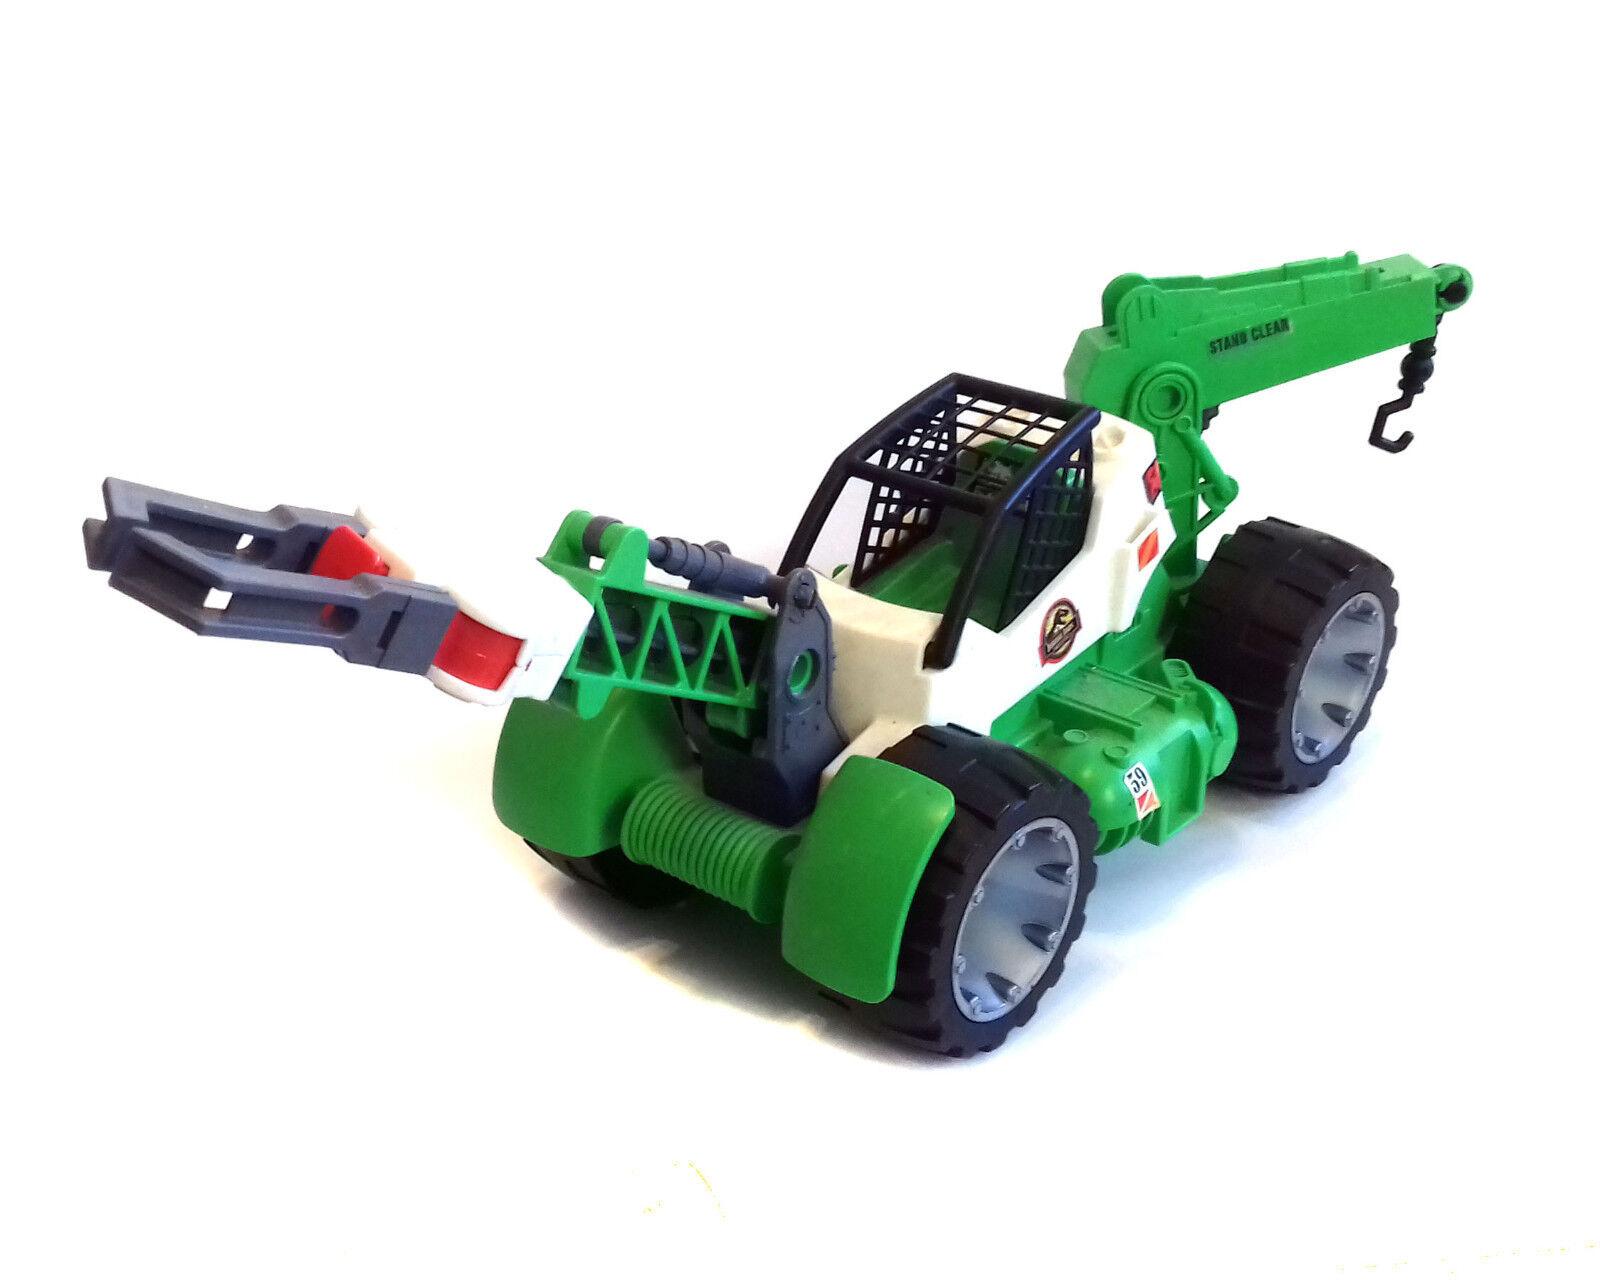 Original Jurassic Park Movie Dinosaur Capture Armourot vehicle toy for 5  figure